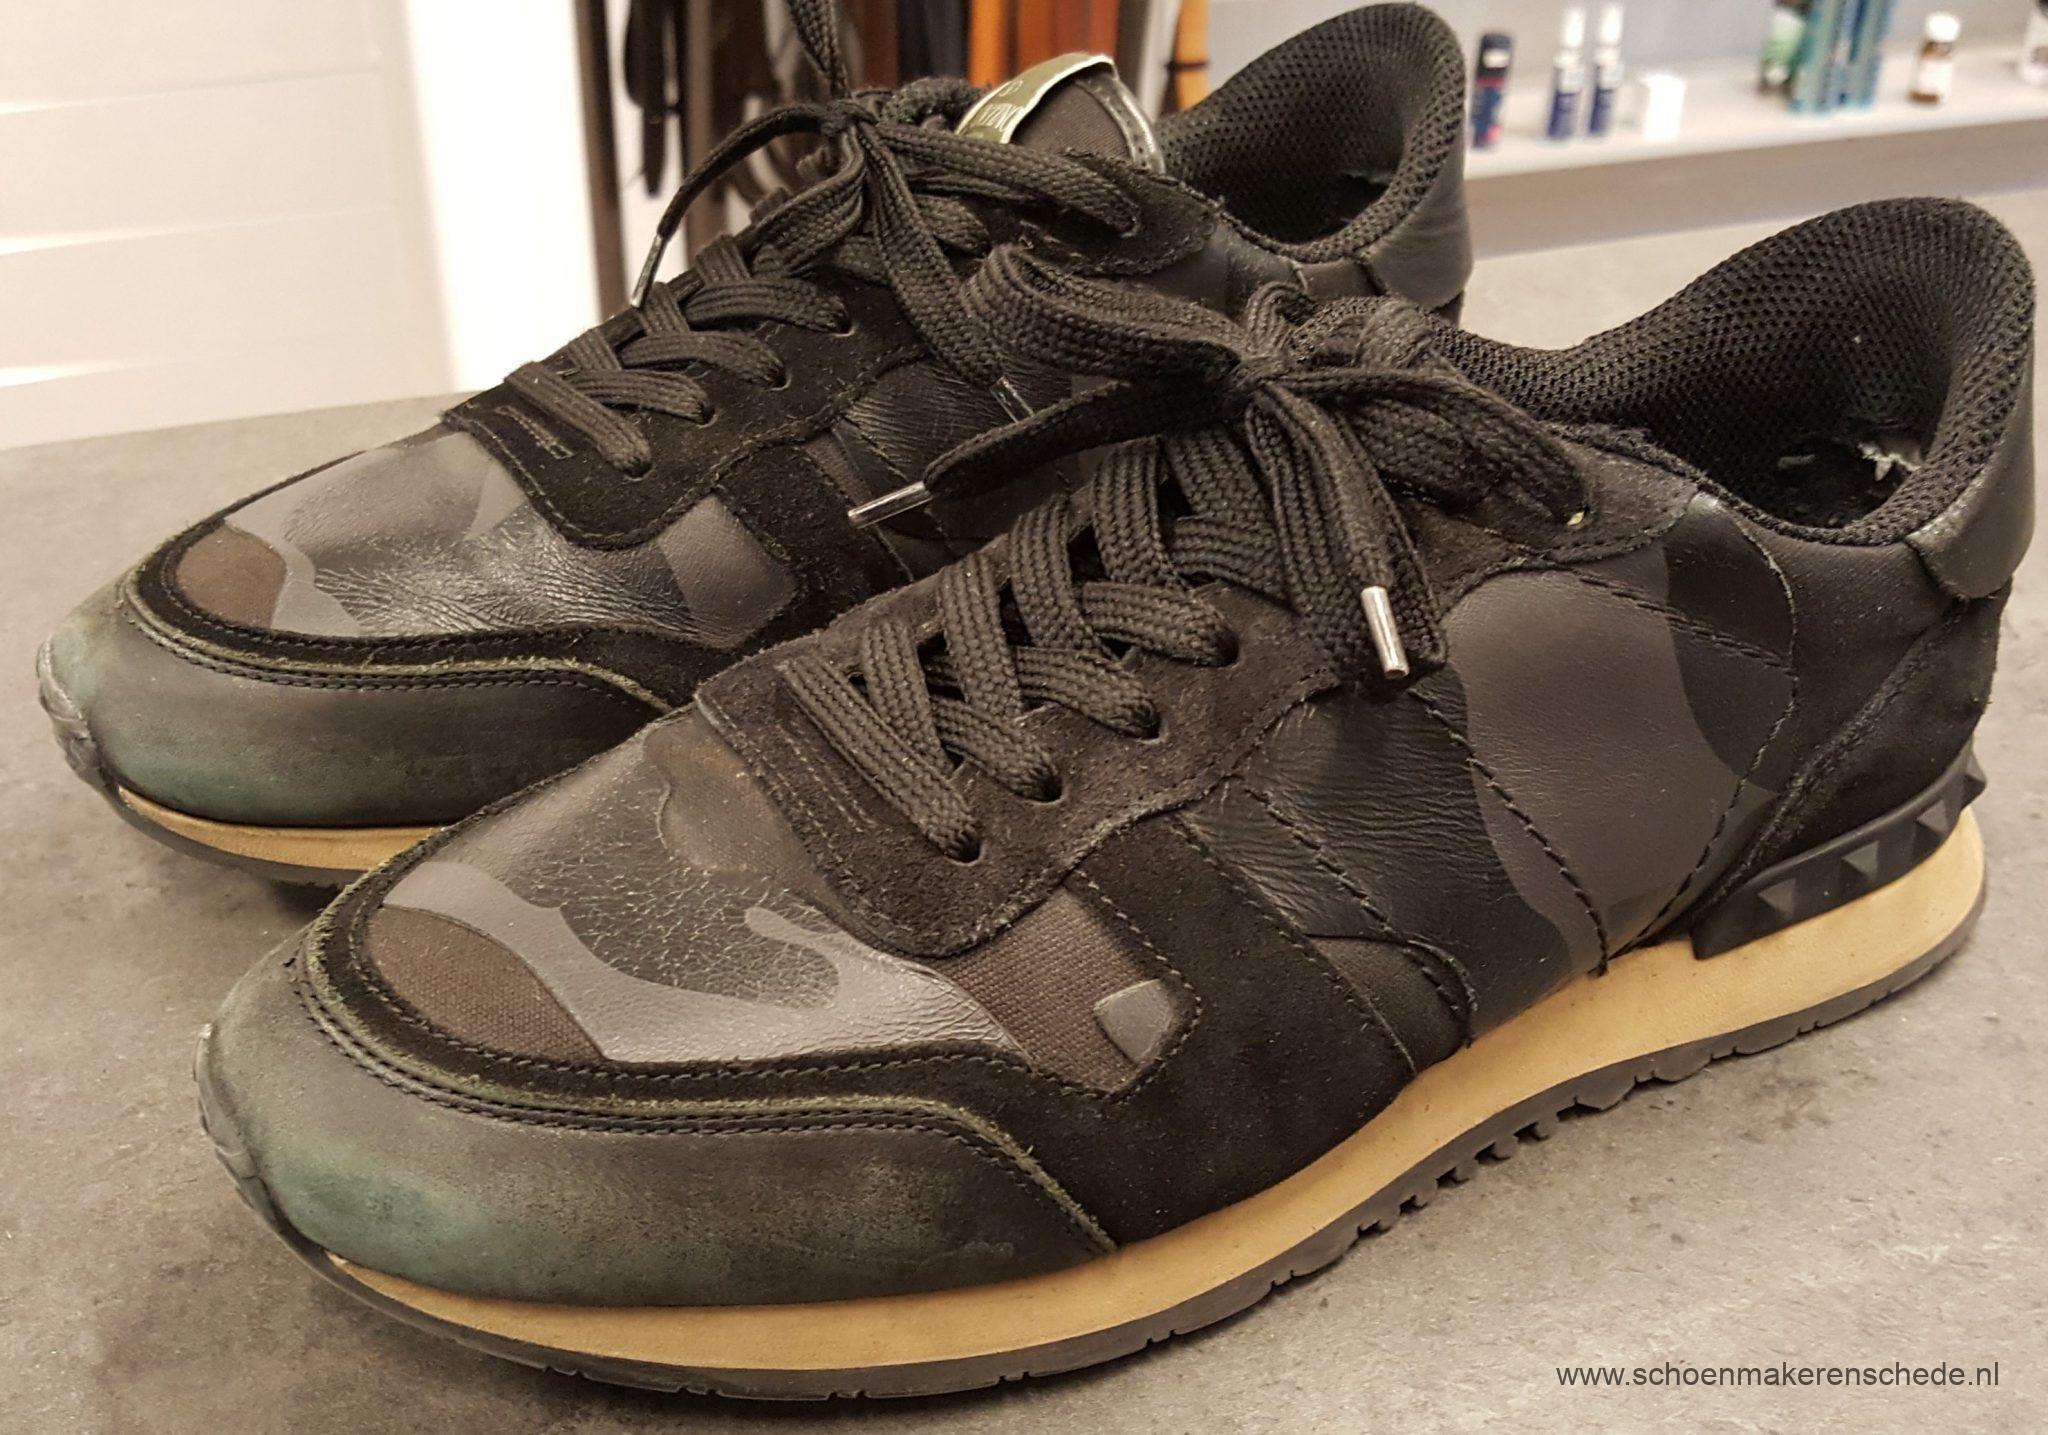 628f57e165b Enschede Schoenen – Verven Laten Schoenmaker D9WE2HI